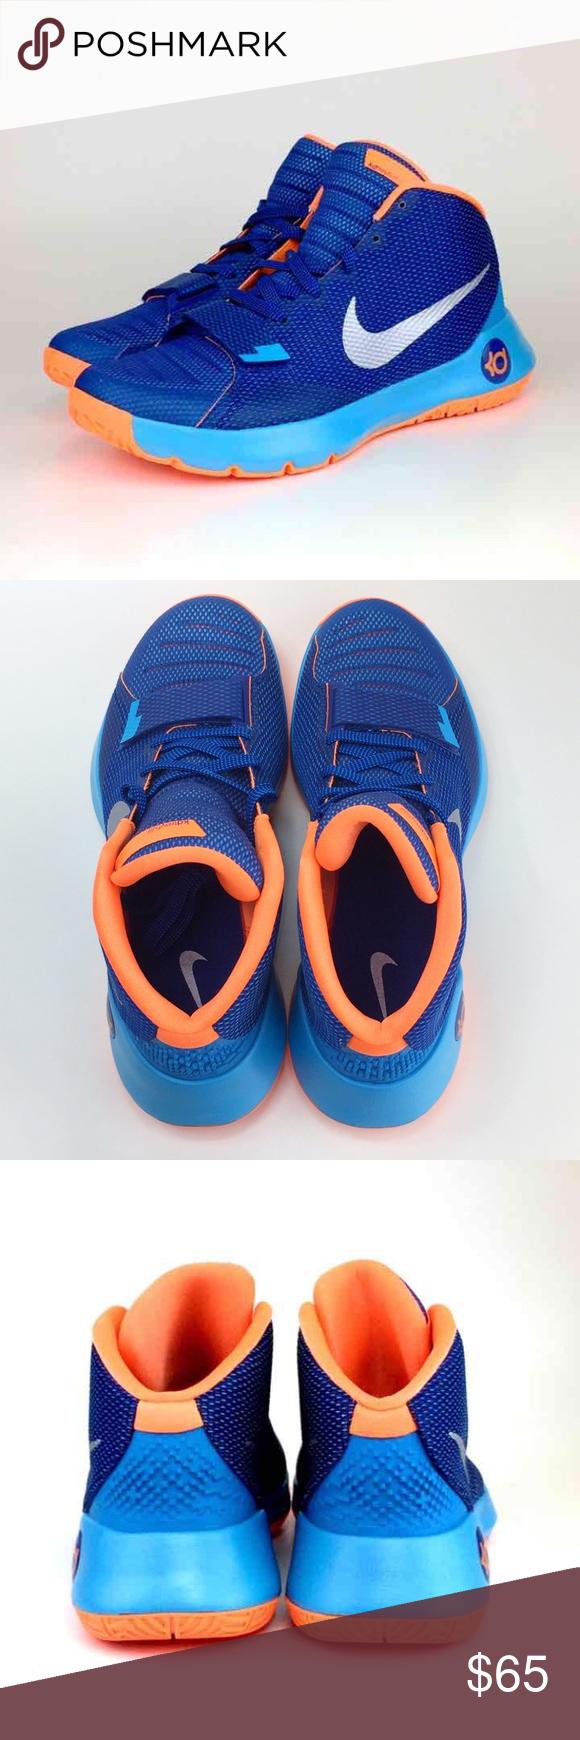 1d2722f029b9 Nike KD Trey 5 III Basketball Shoes NWOB Nike KD Trey 5 III Basketball Shoes